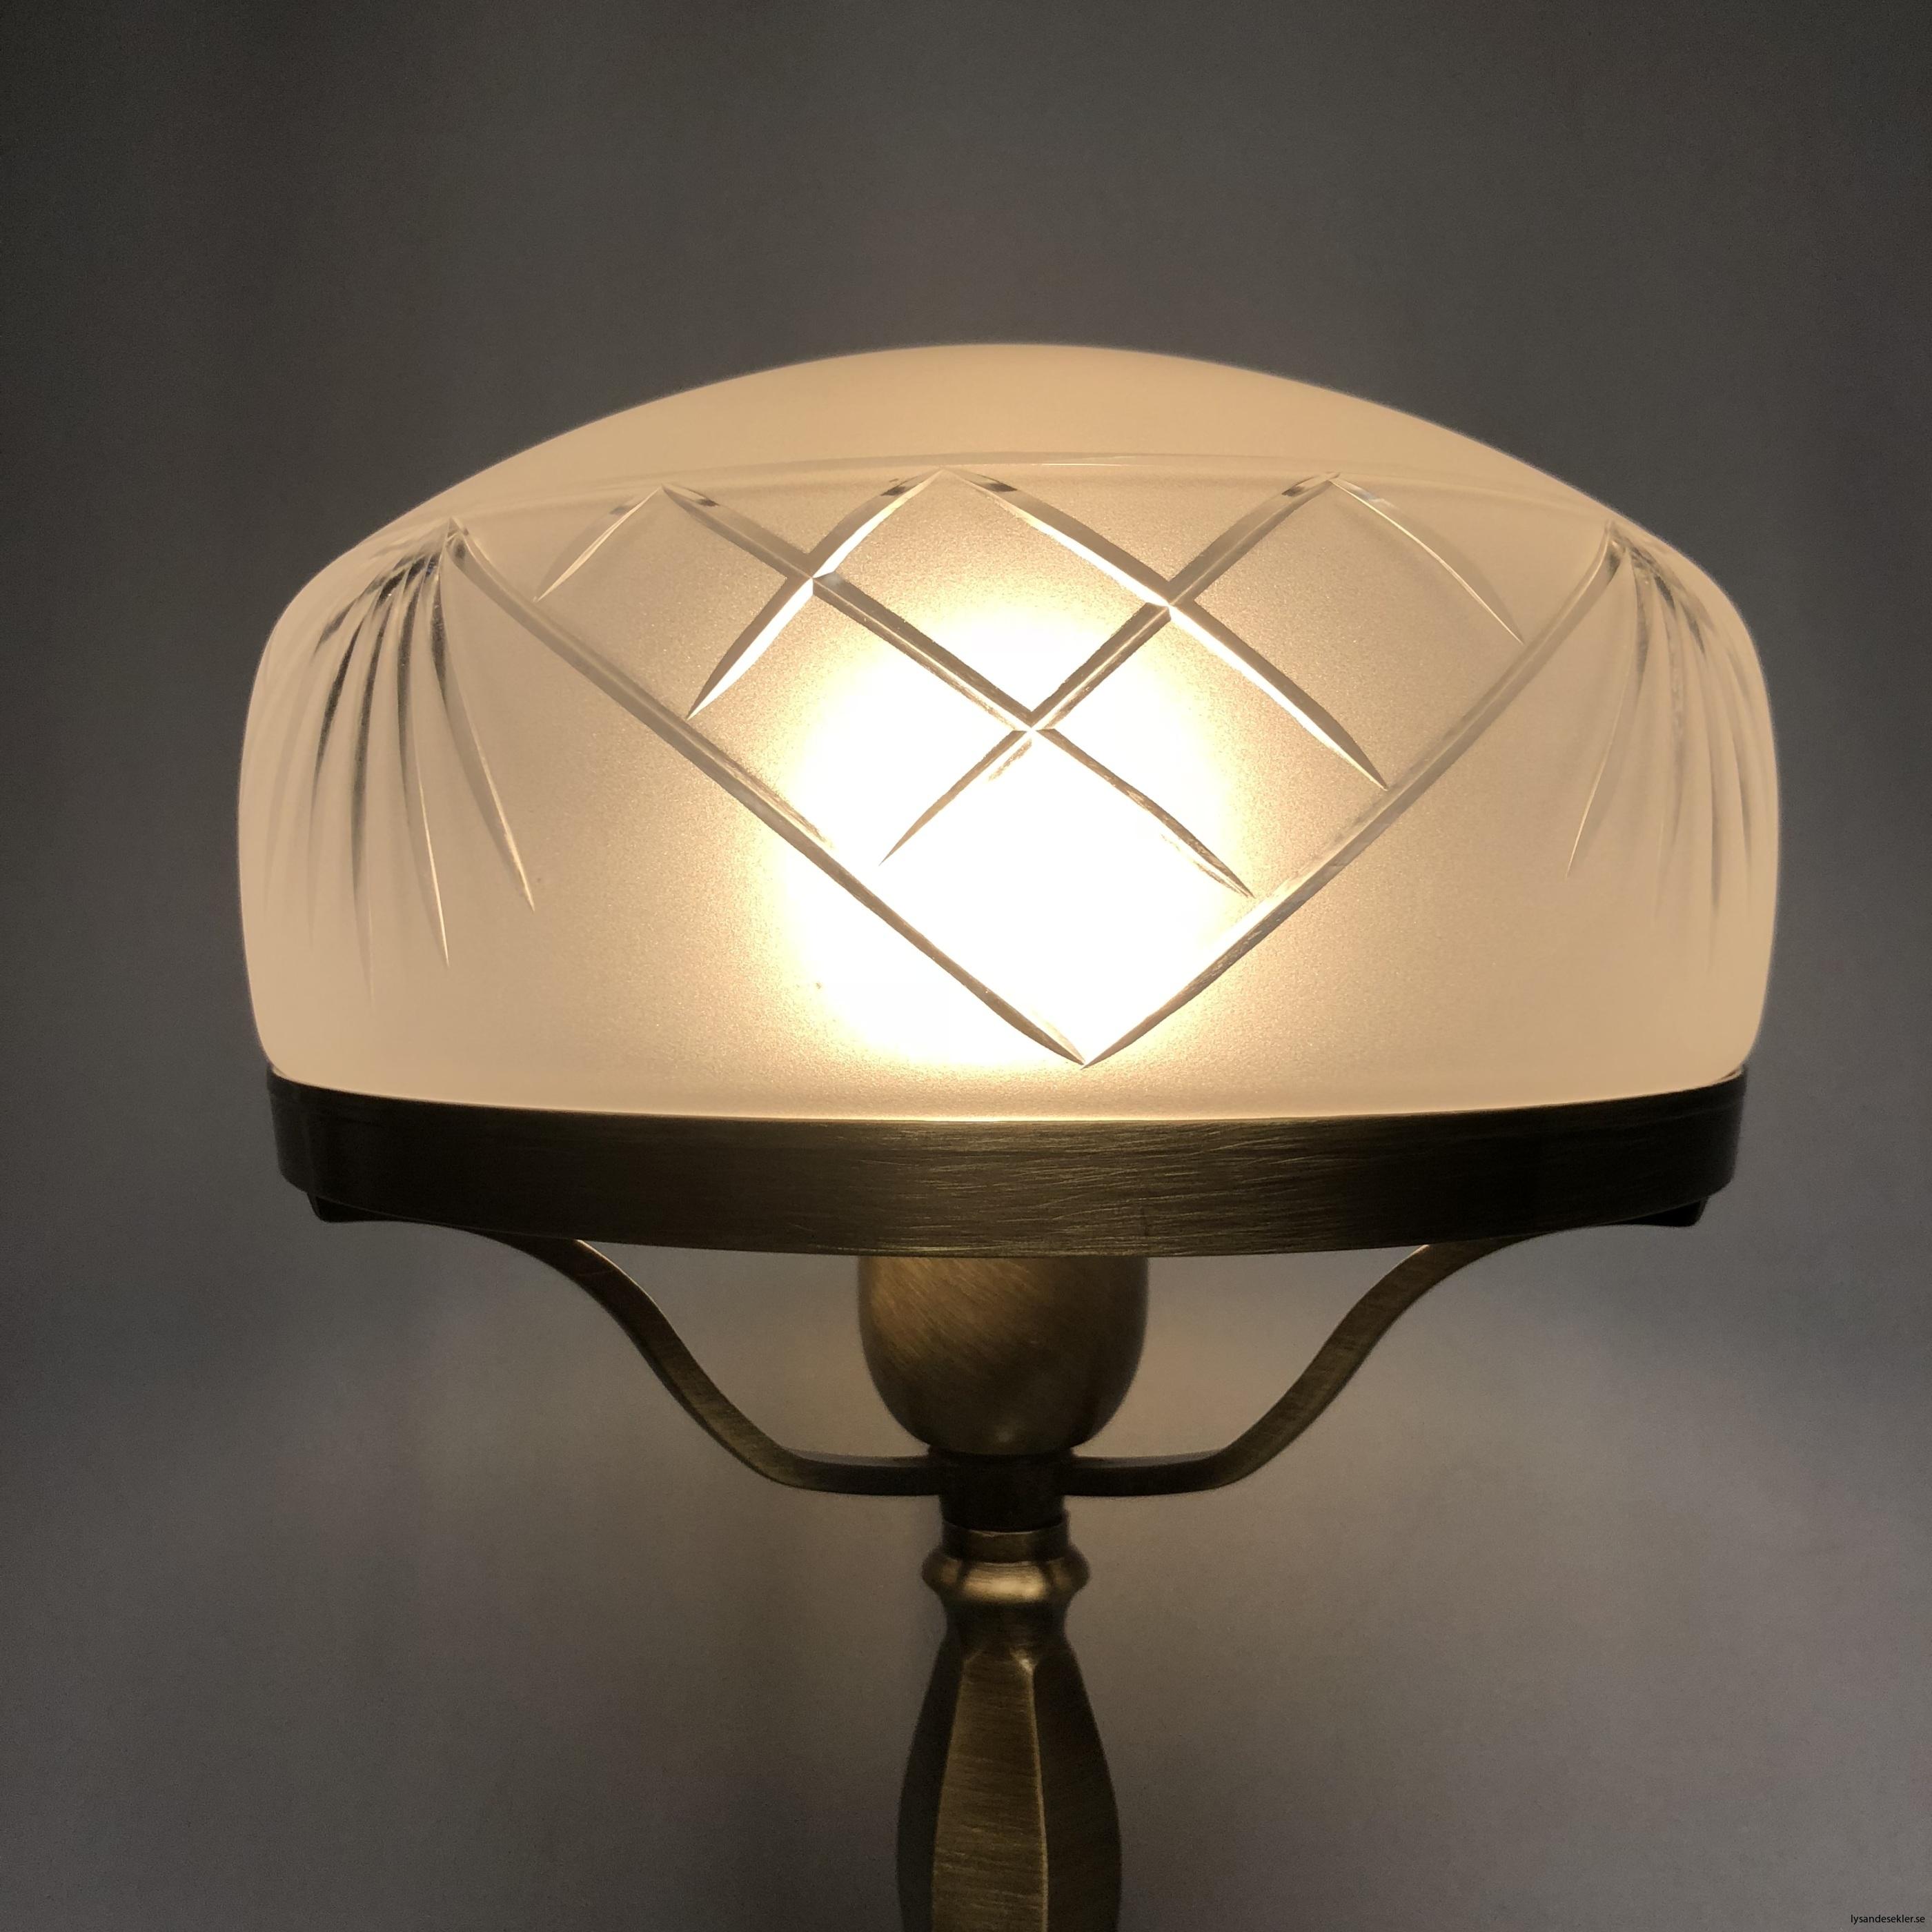 strindbergslampa strindbergslampor strindberg lampa skärm kupa strindbergsskärm strindbergskupa29